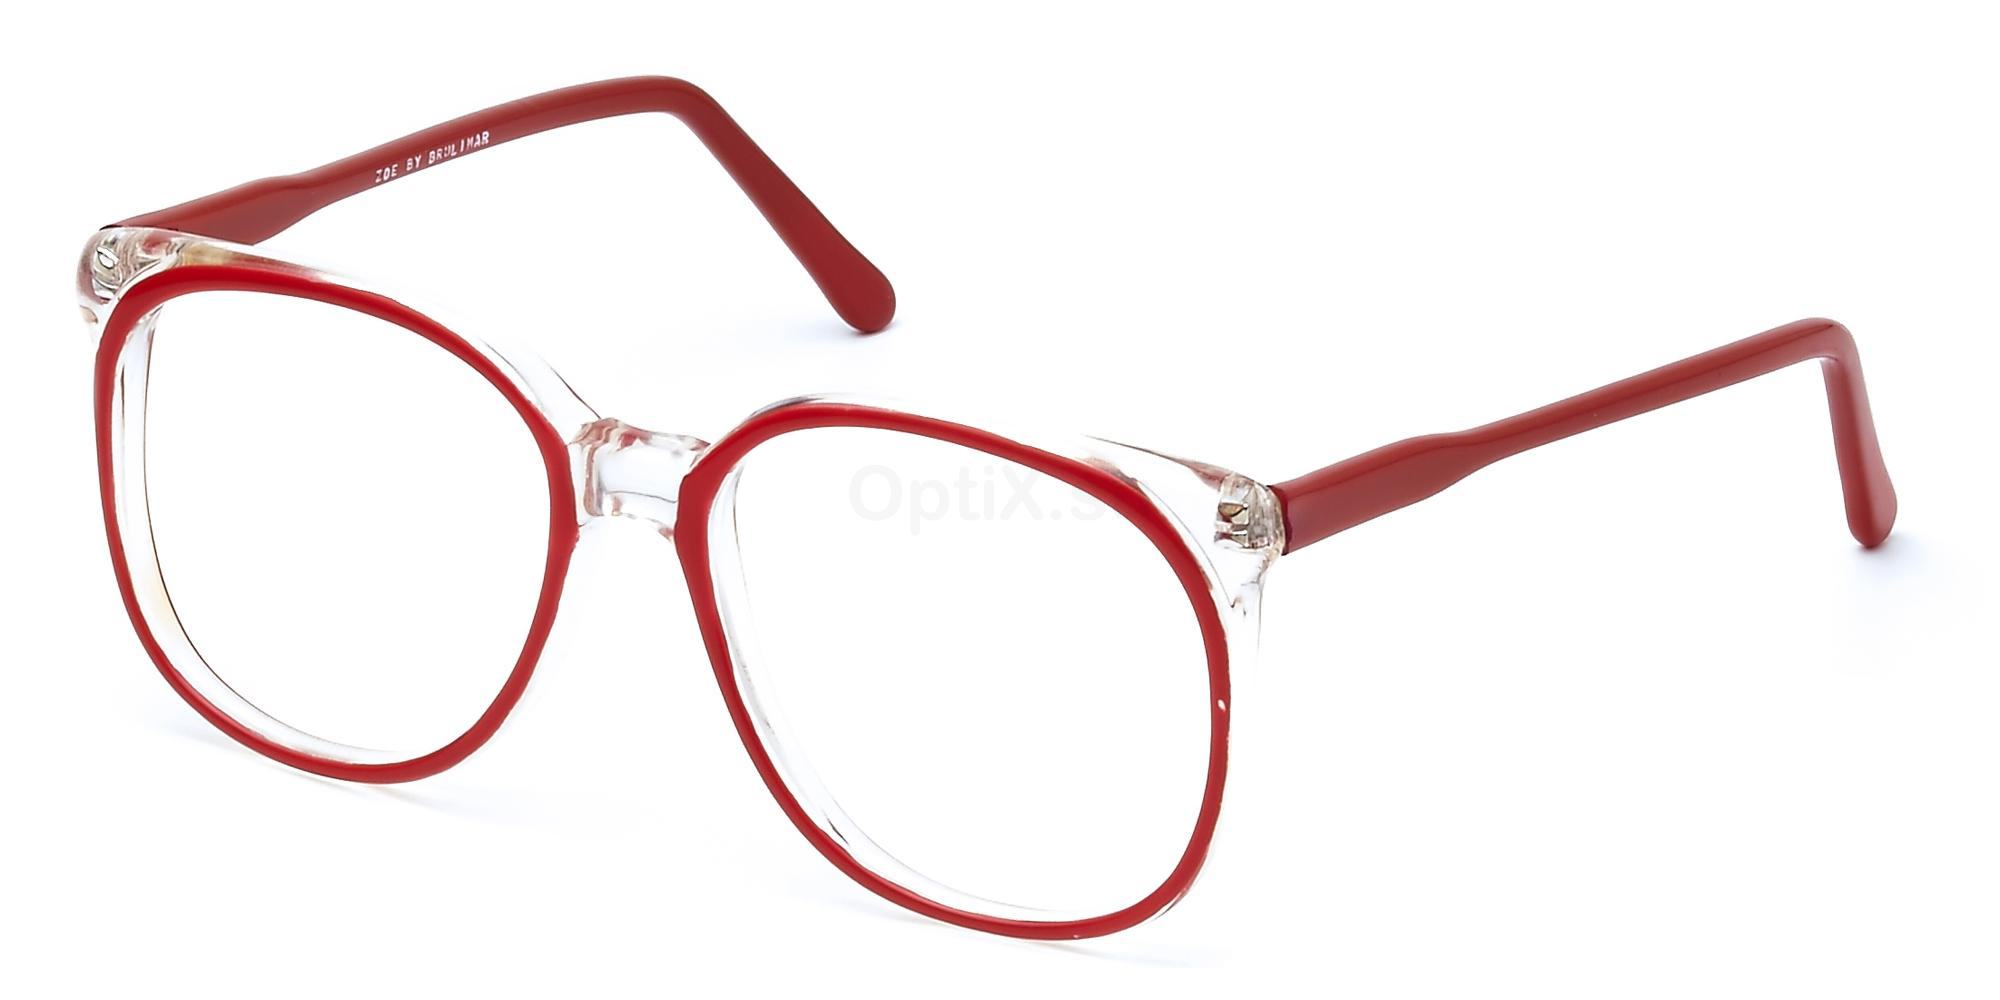 C182 ZOE2182 Glasses, Zoe Vintage